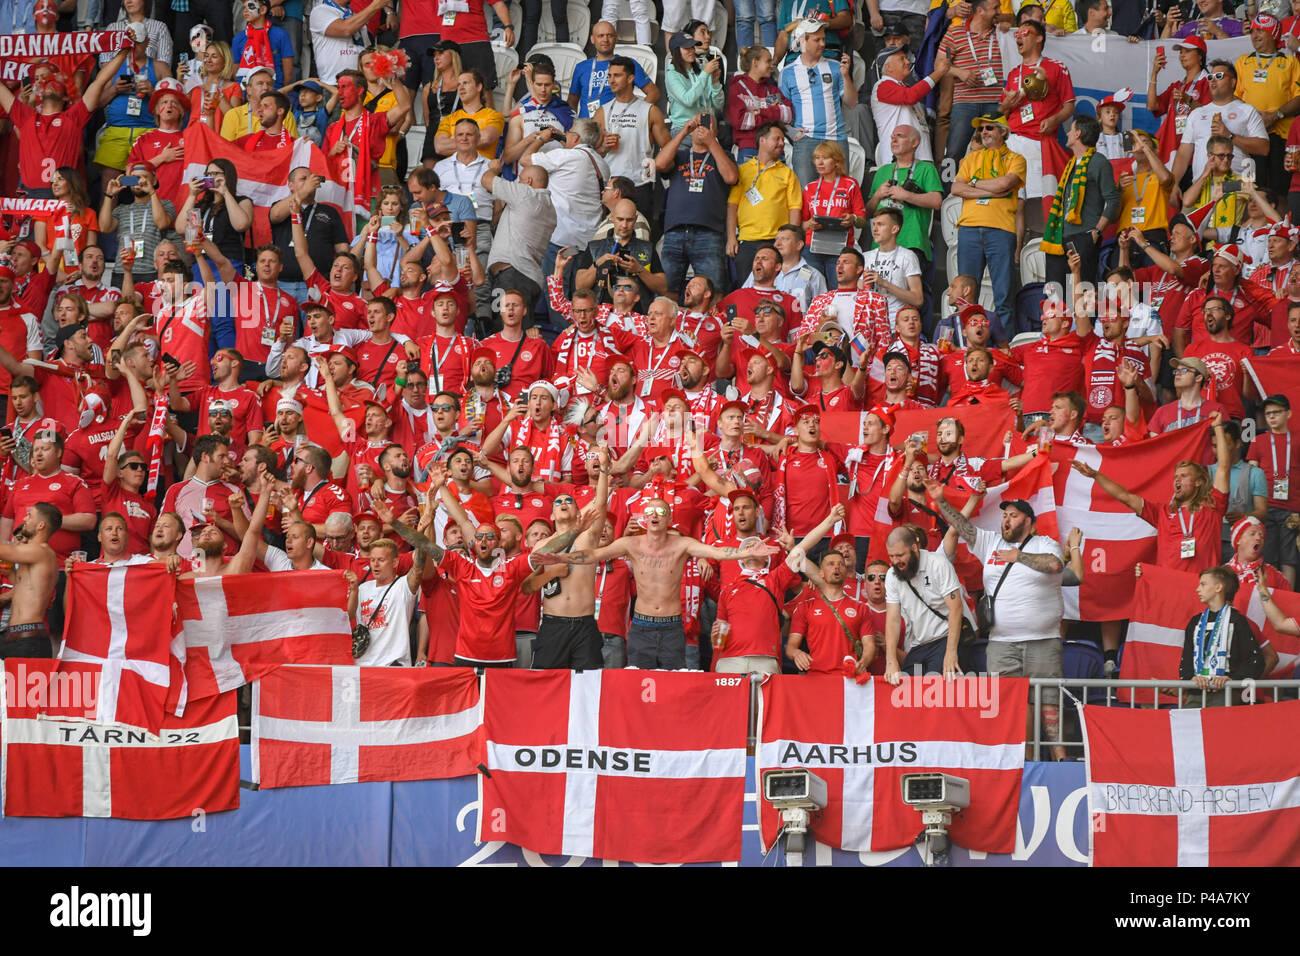 Samara Arena, Samara, Russia. 21st June, 2018. FIFA World Cup Football, Group C Denmark versus Australia; Danish fans massed ready for the game Credit: Action Plus Sports/Alamy Live News Stock Photo